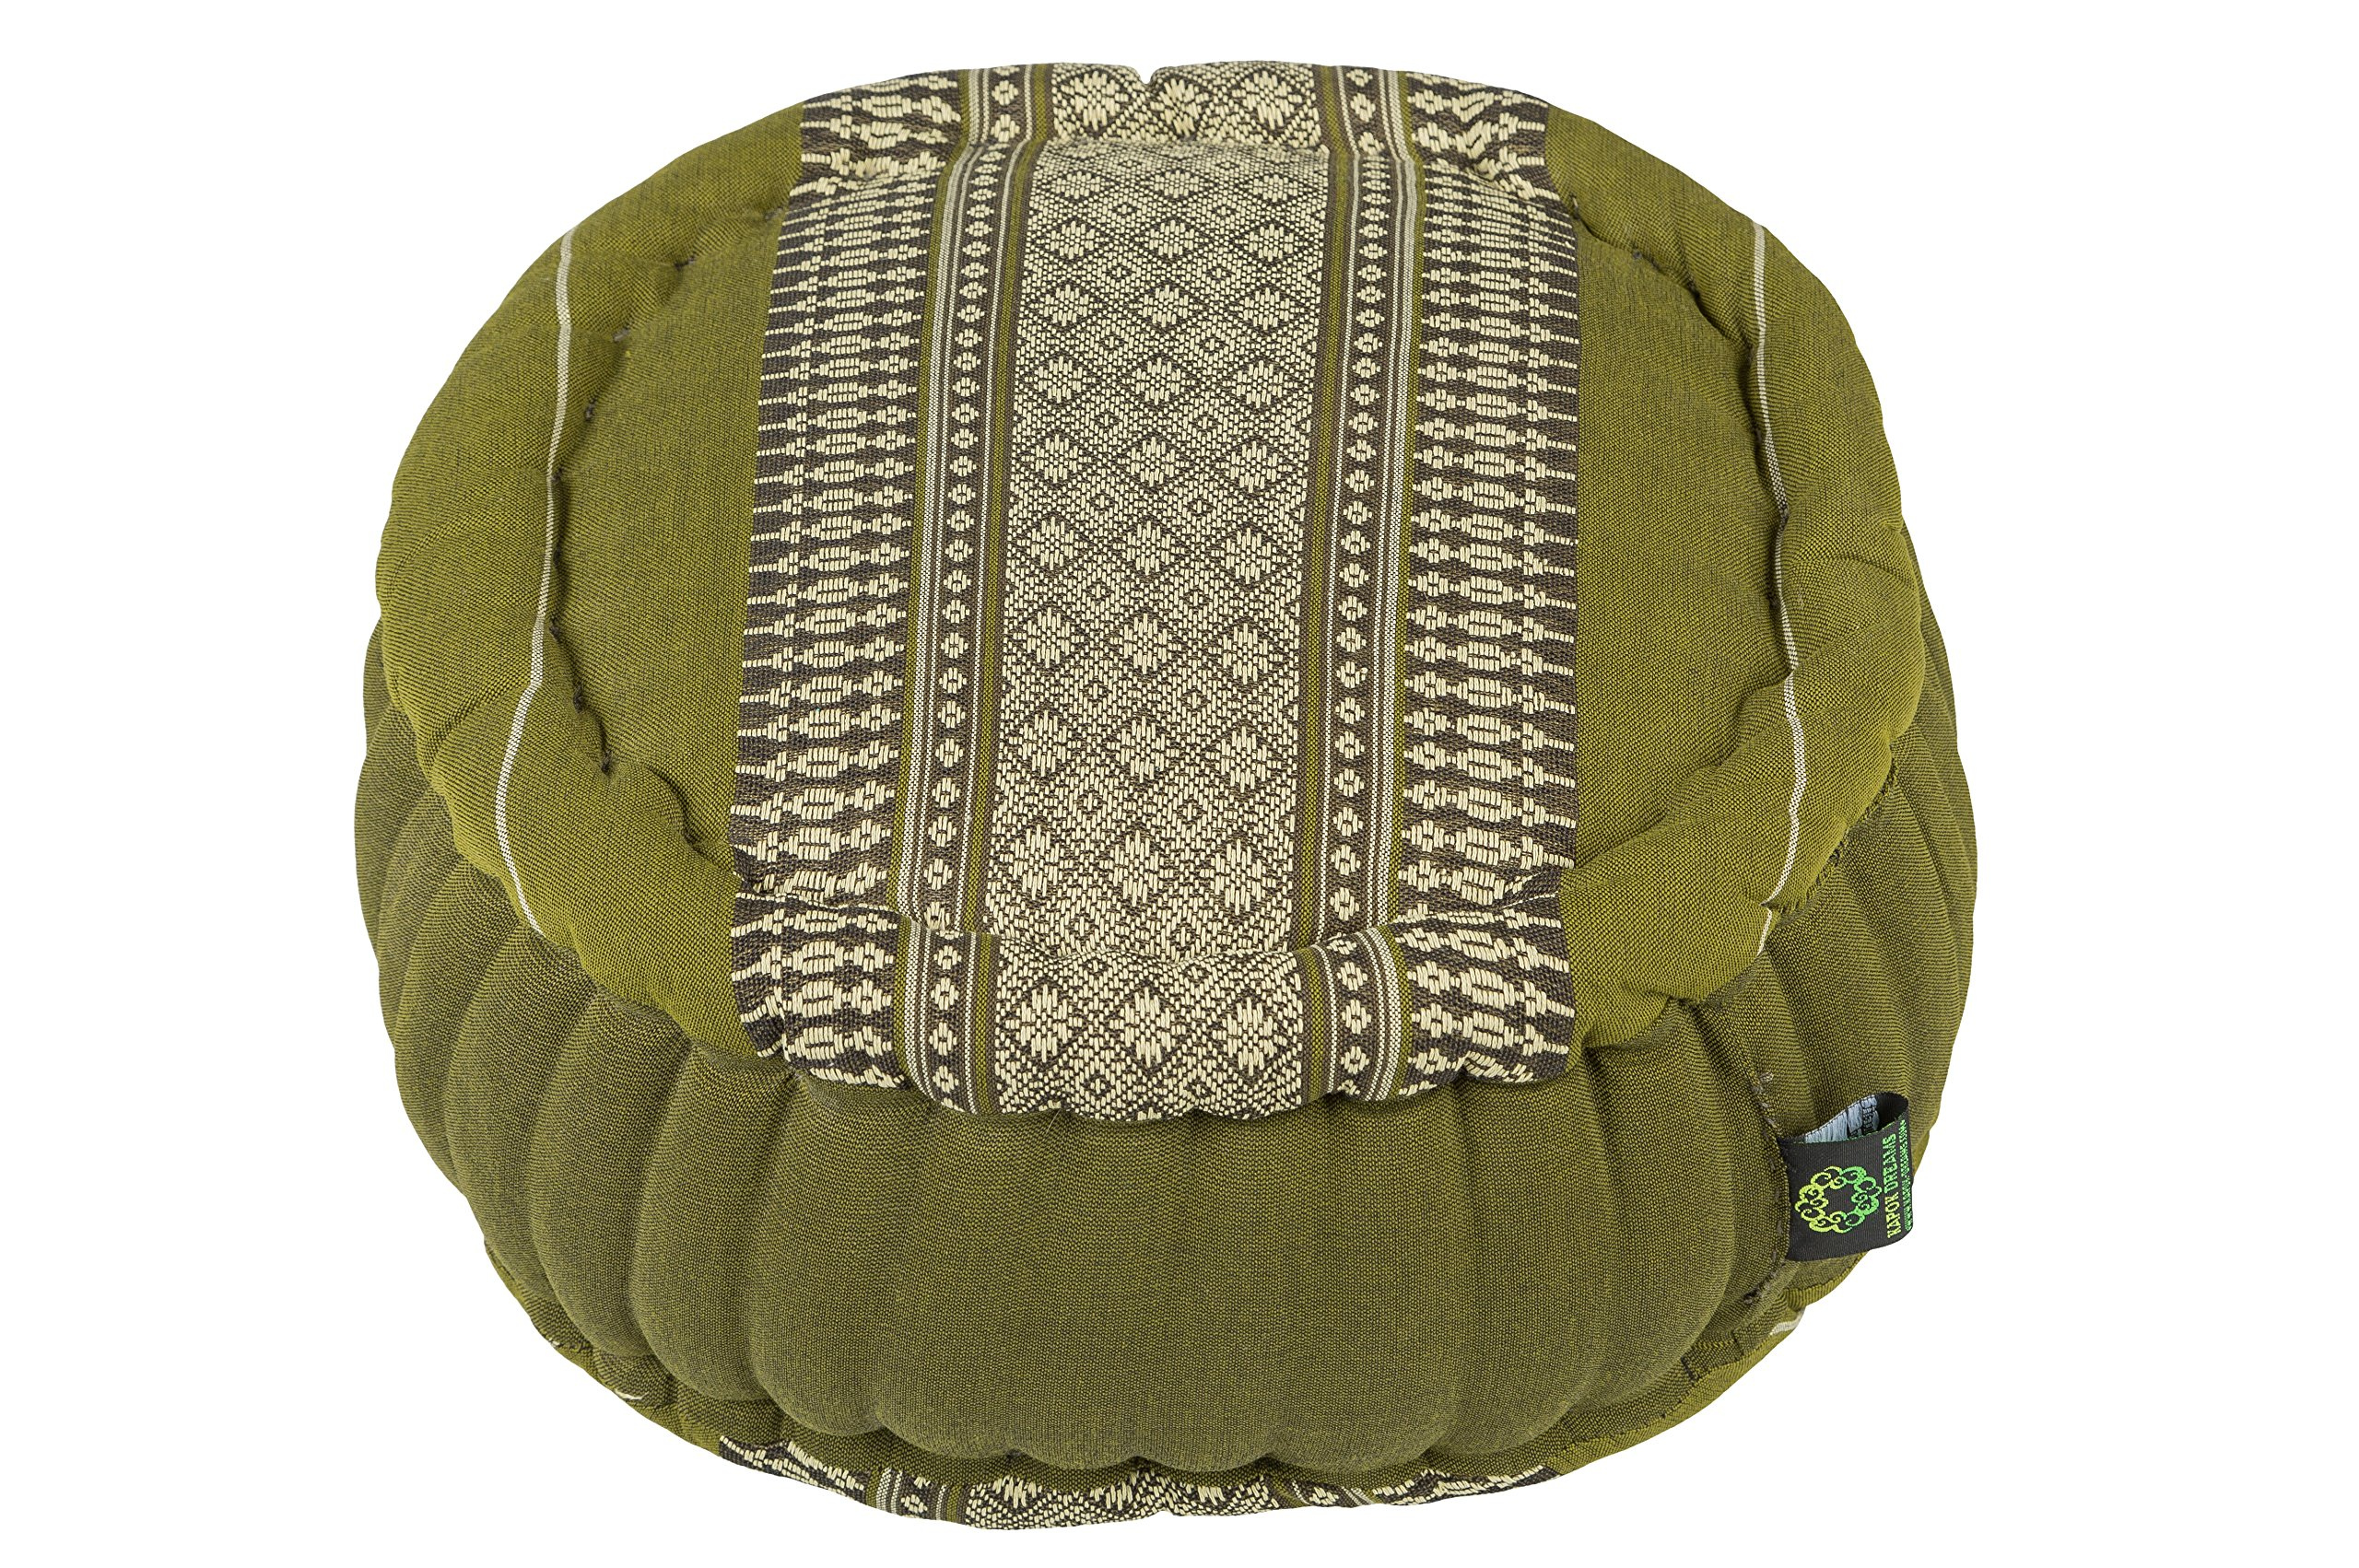 Zafu Round Cushion 100% Kapok, Bamboo Green Thai Design by Kapok Dreams